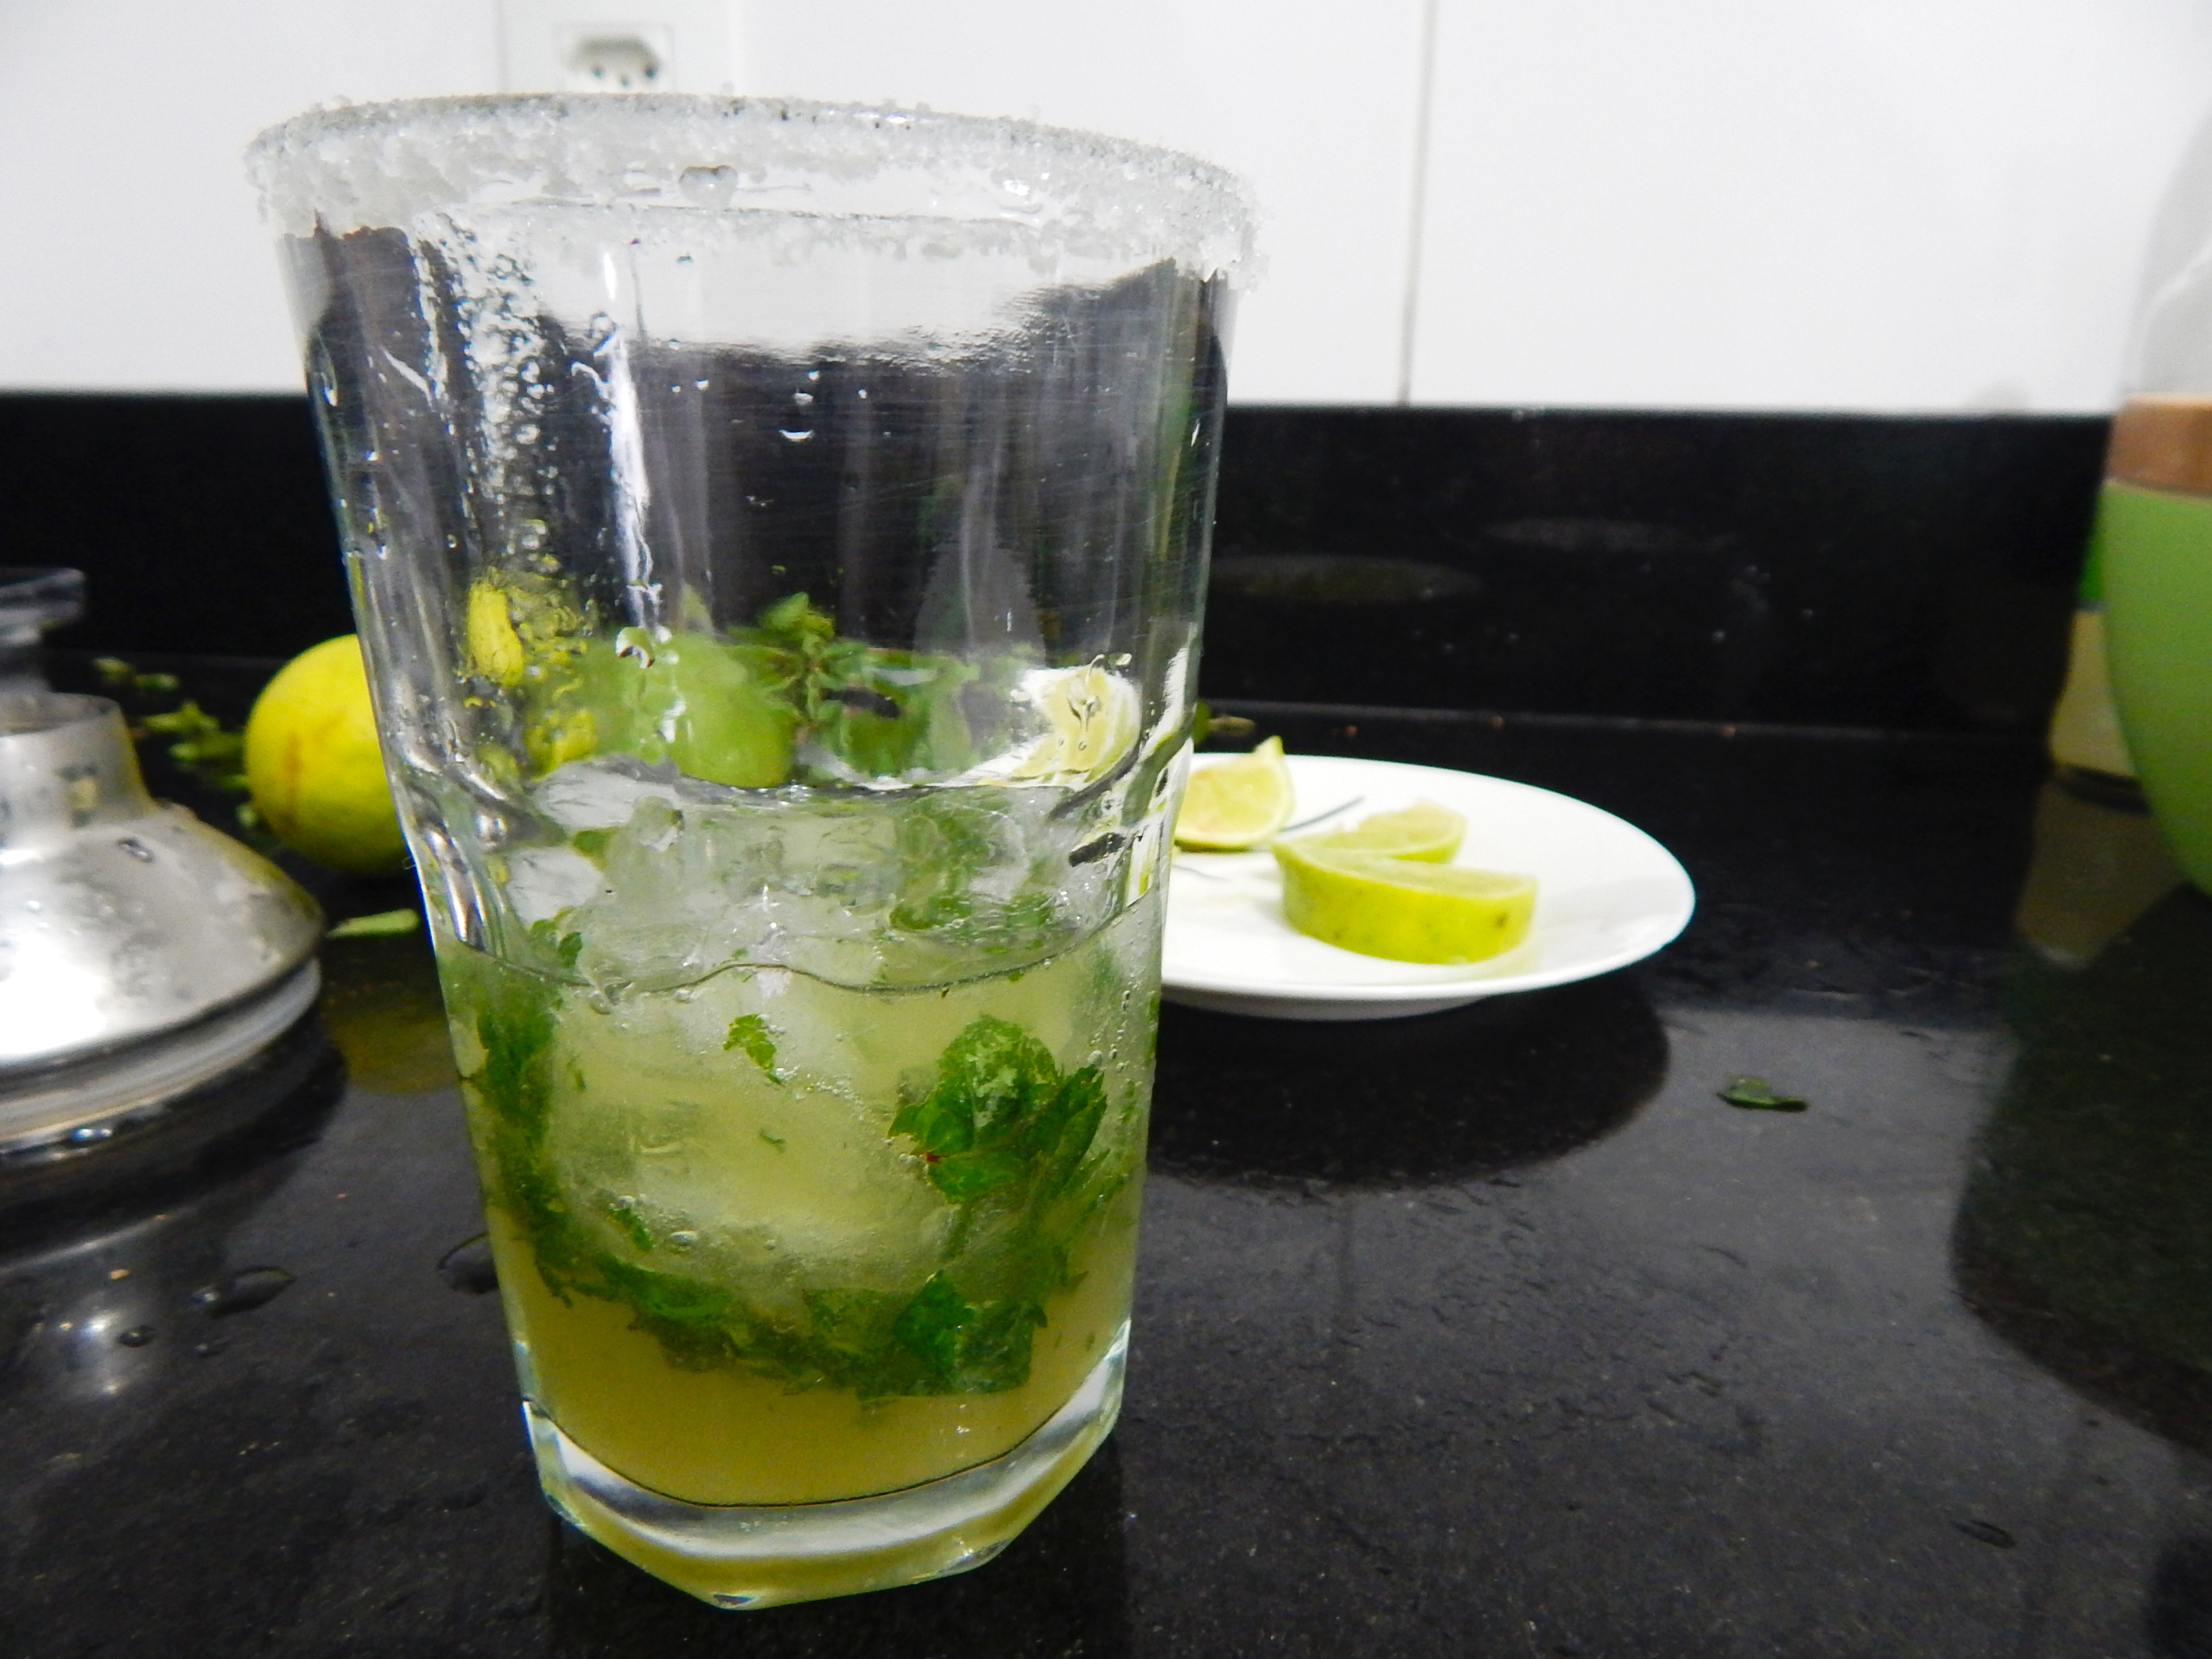 despeje-bebida-preencha-metade-copo-long-drink-receita-drink-mojito-na-cozinha-sozinho